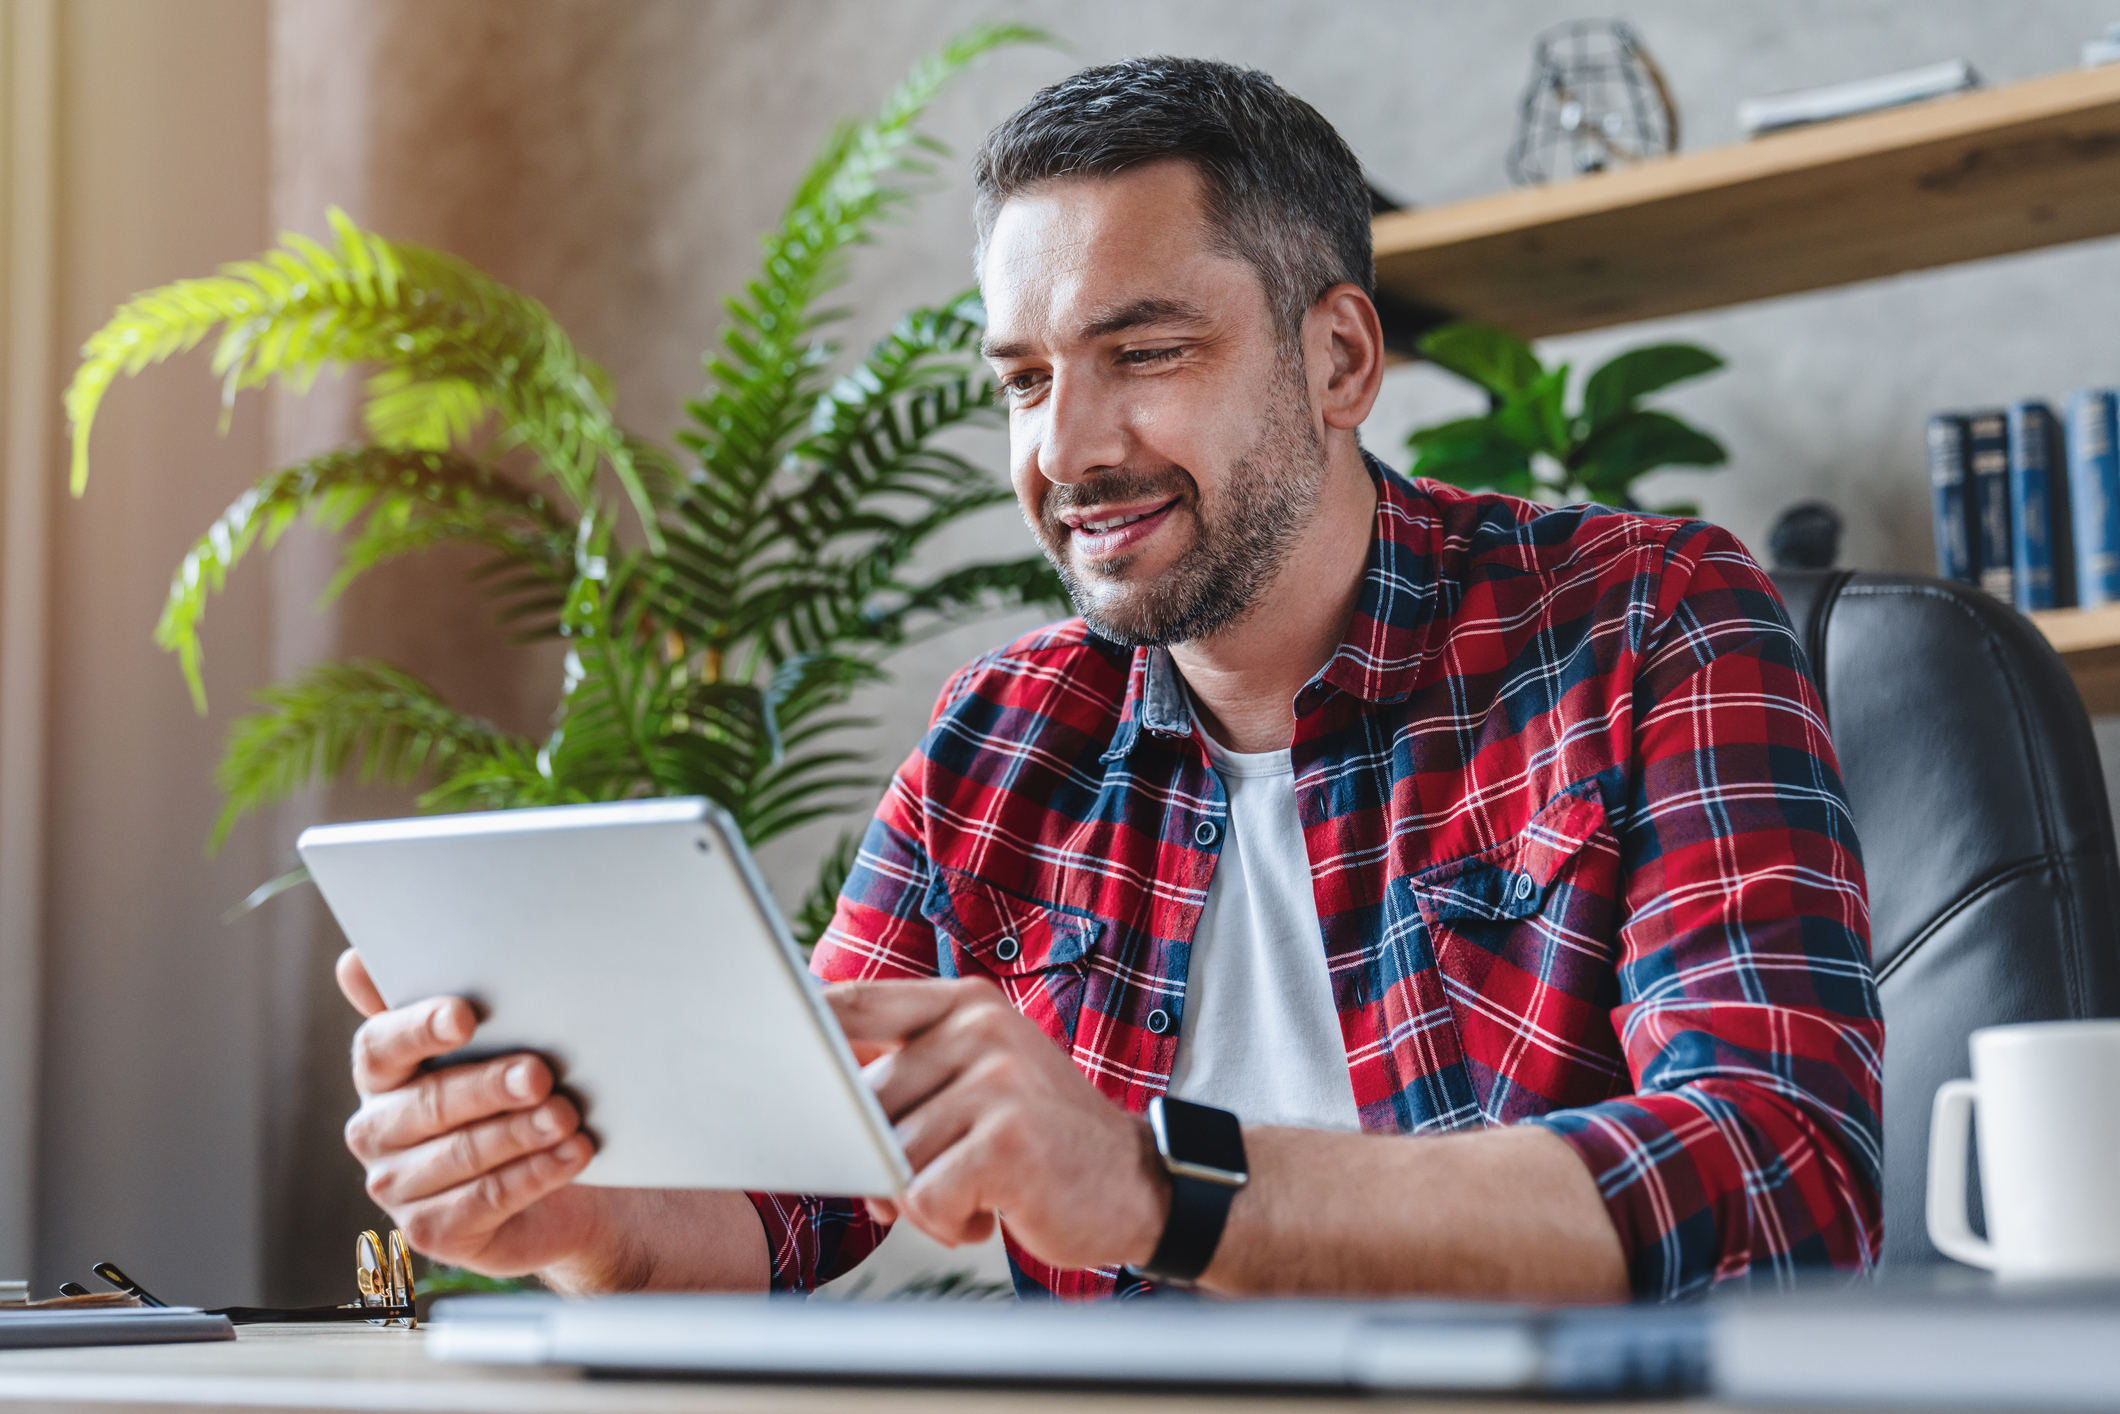 Man on tablet exploring different apps for Digital Marketing